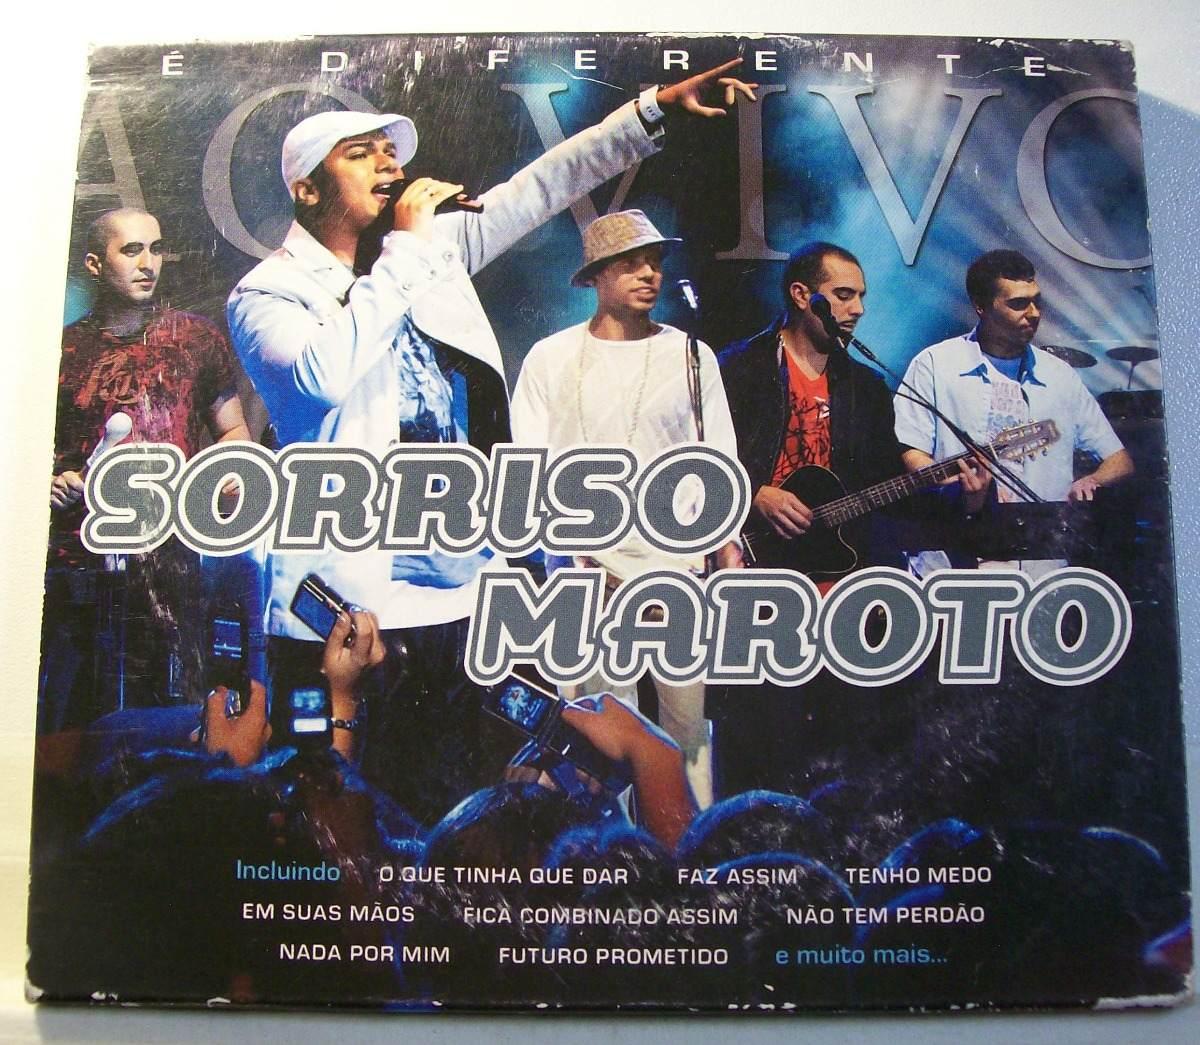 SORRISO BAIXAR AO DIFERENTE CD VIVO 2007 MAROTO